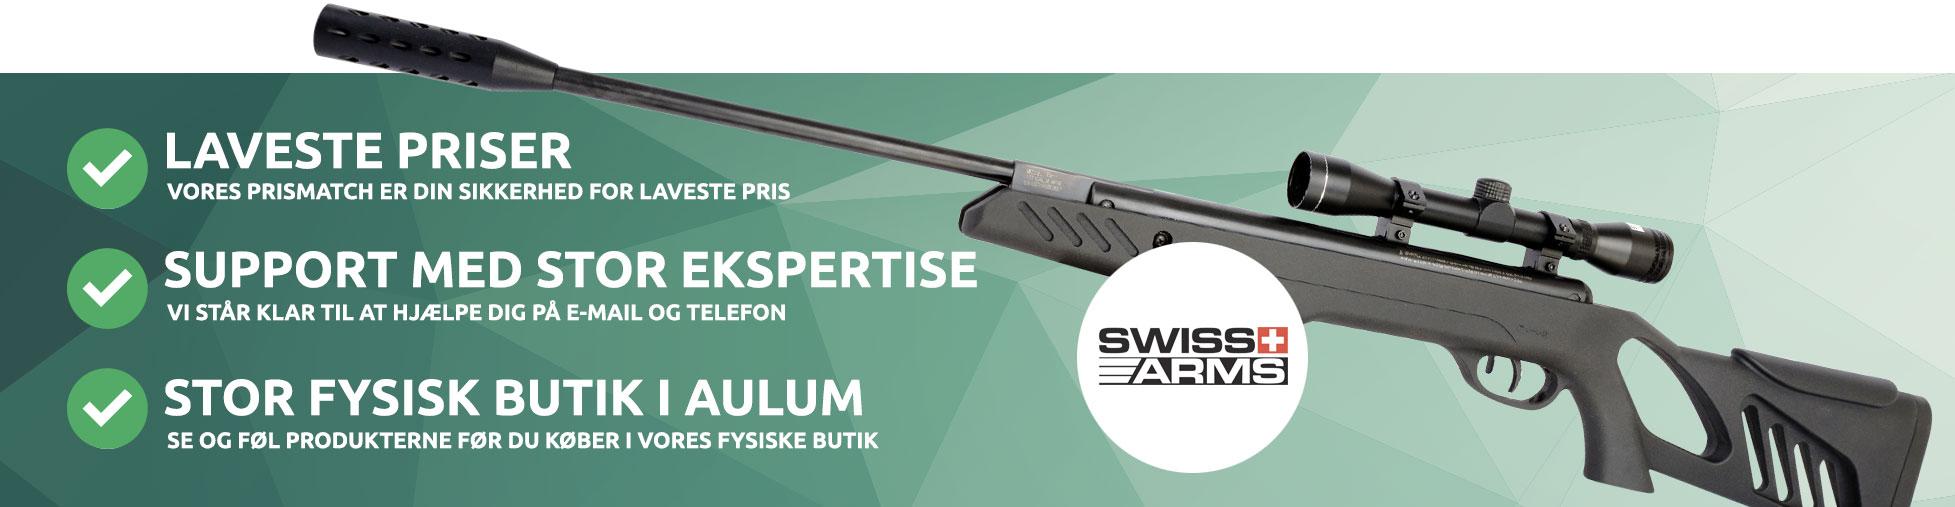 Swiss arms luftgevær